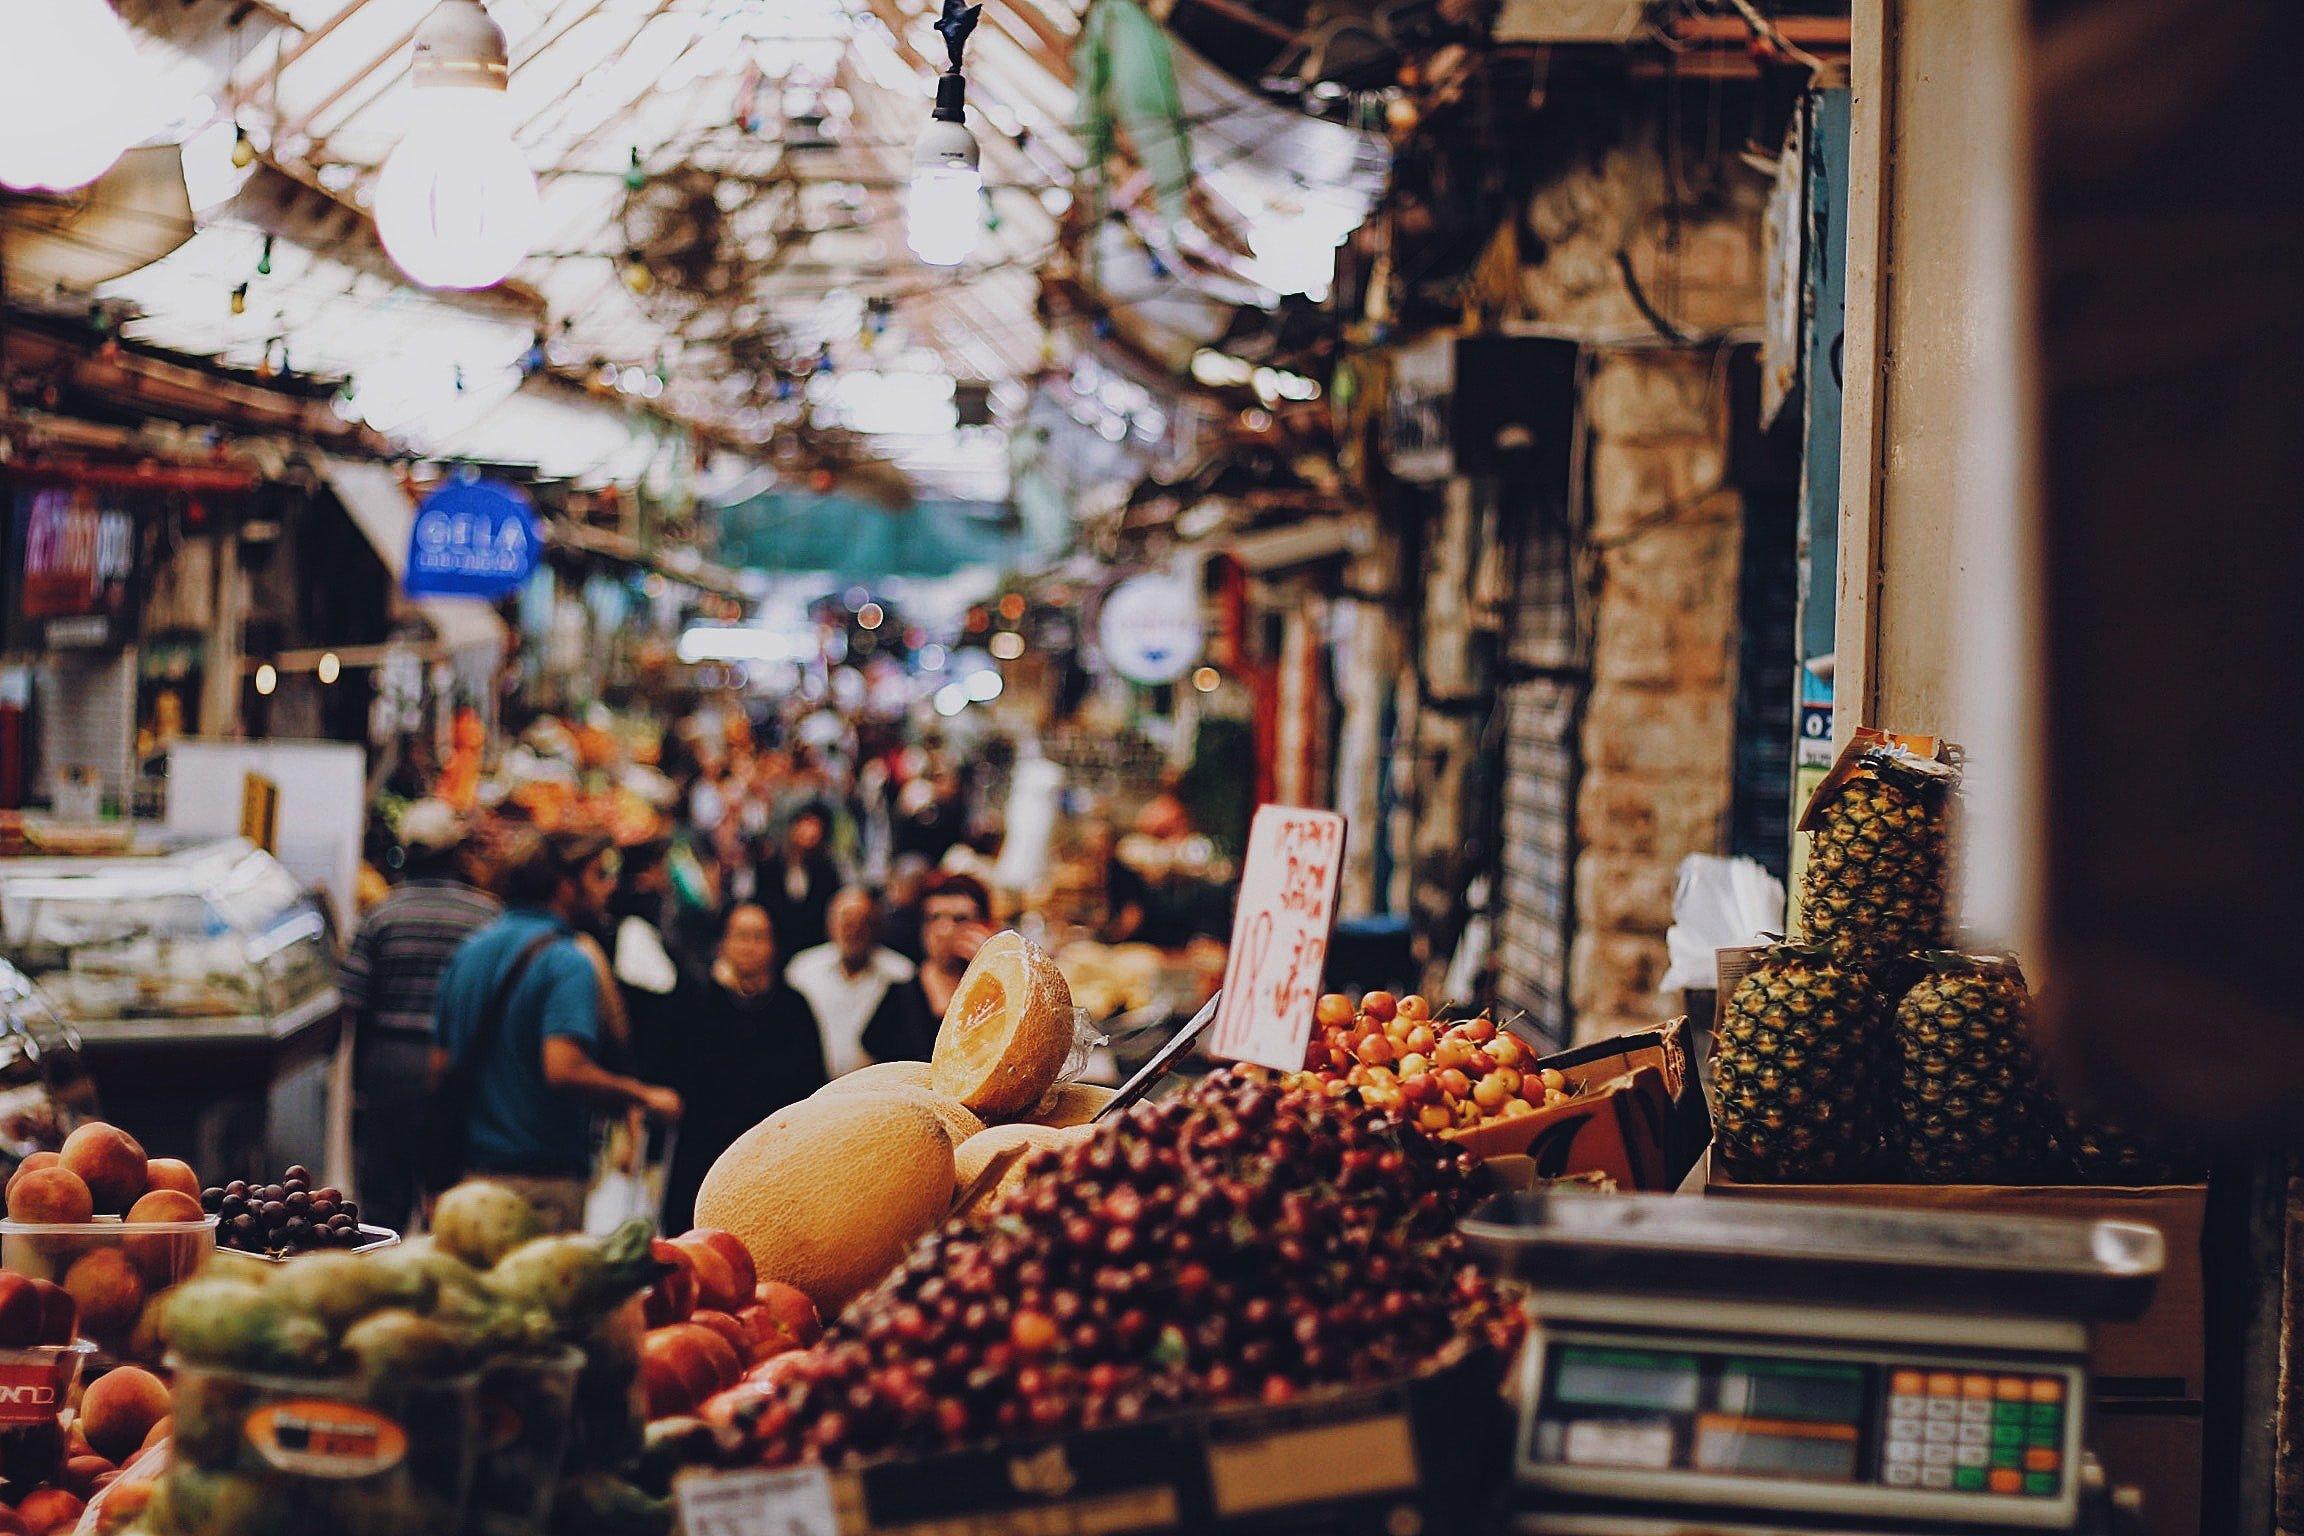 Machaneh Yehuda Market And Cooking Workshop